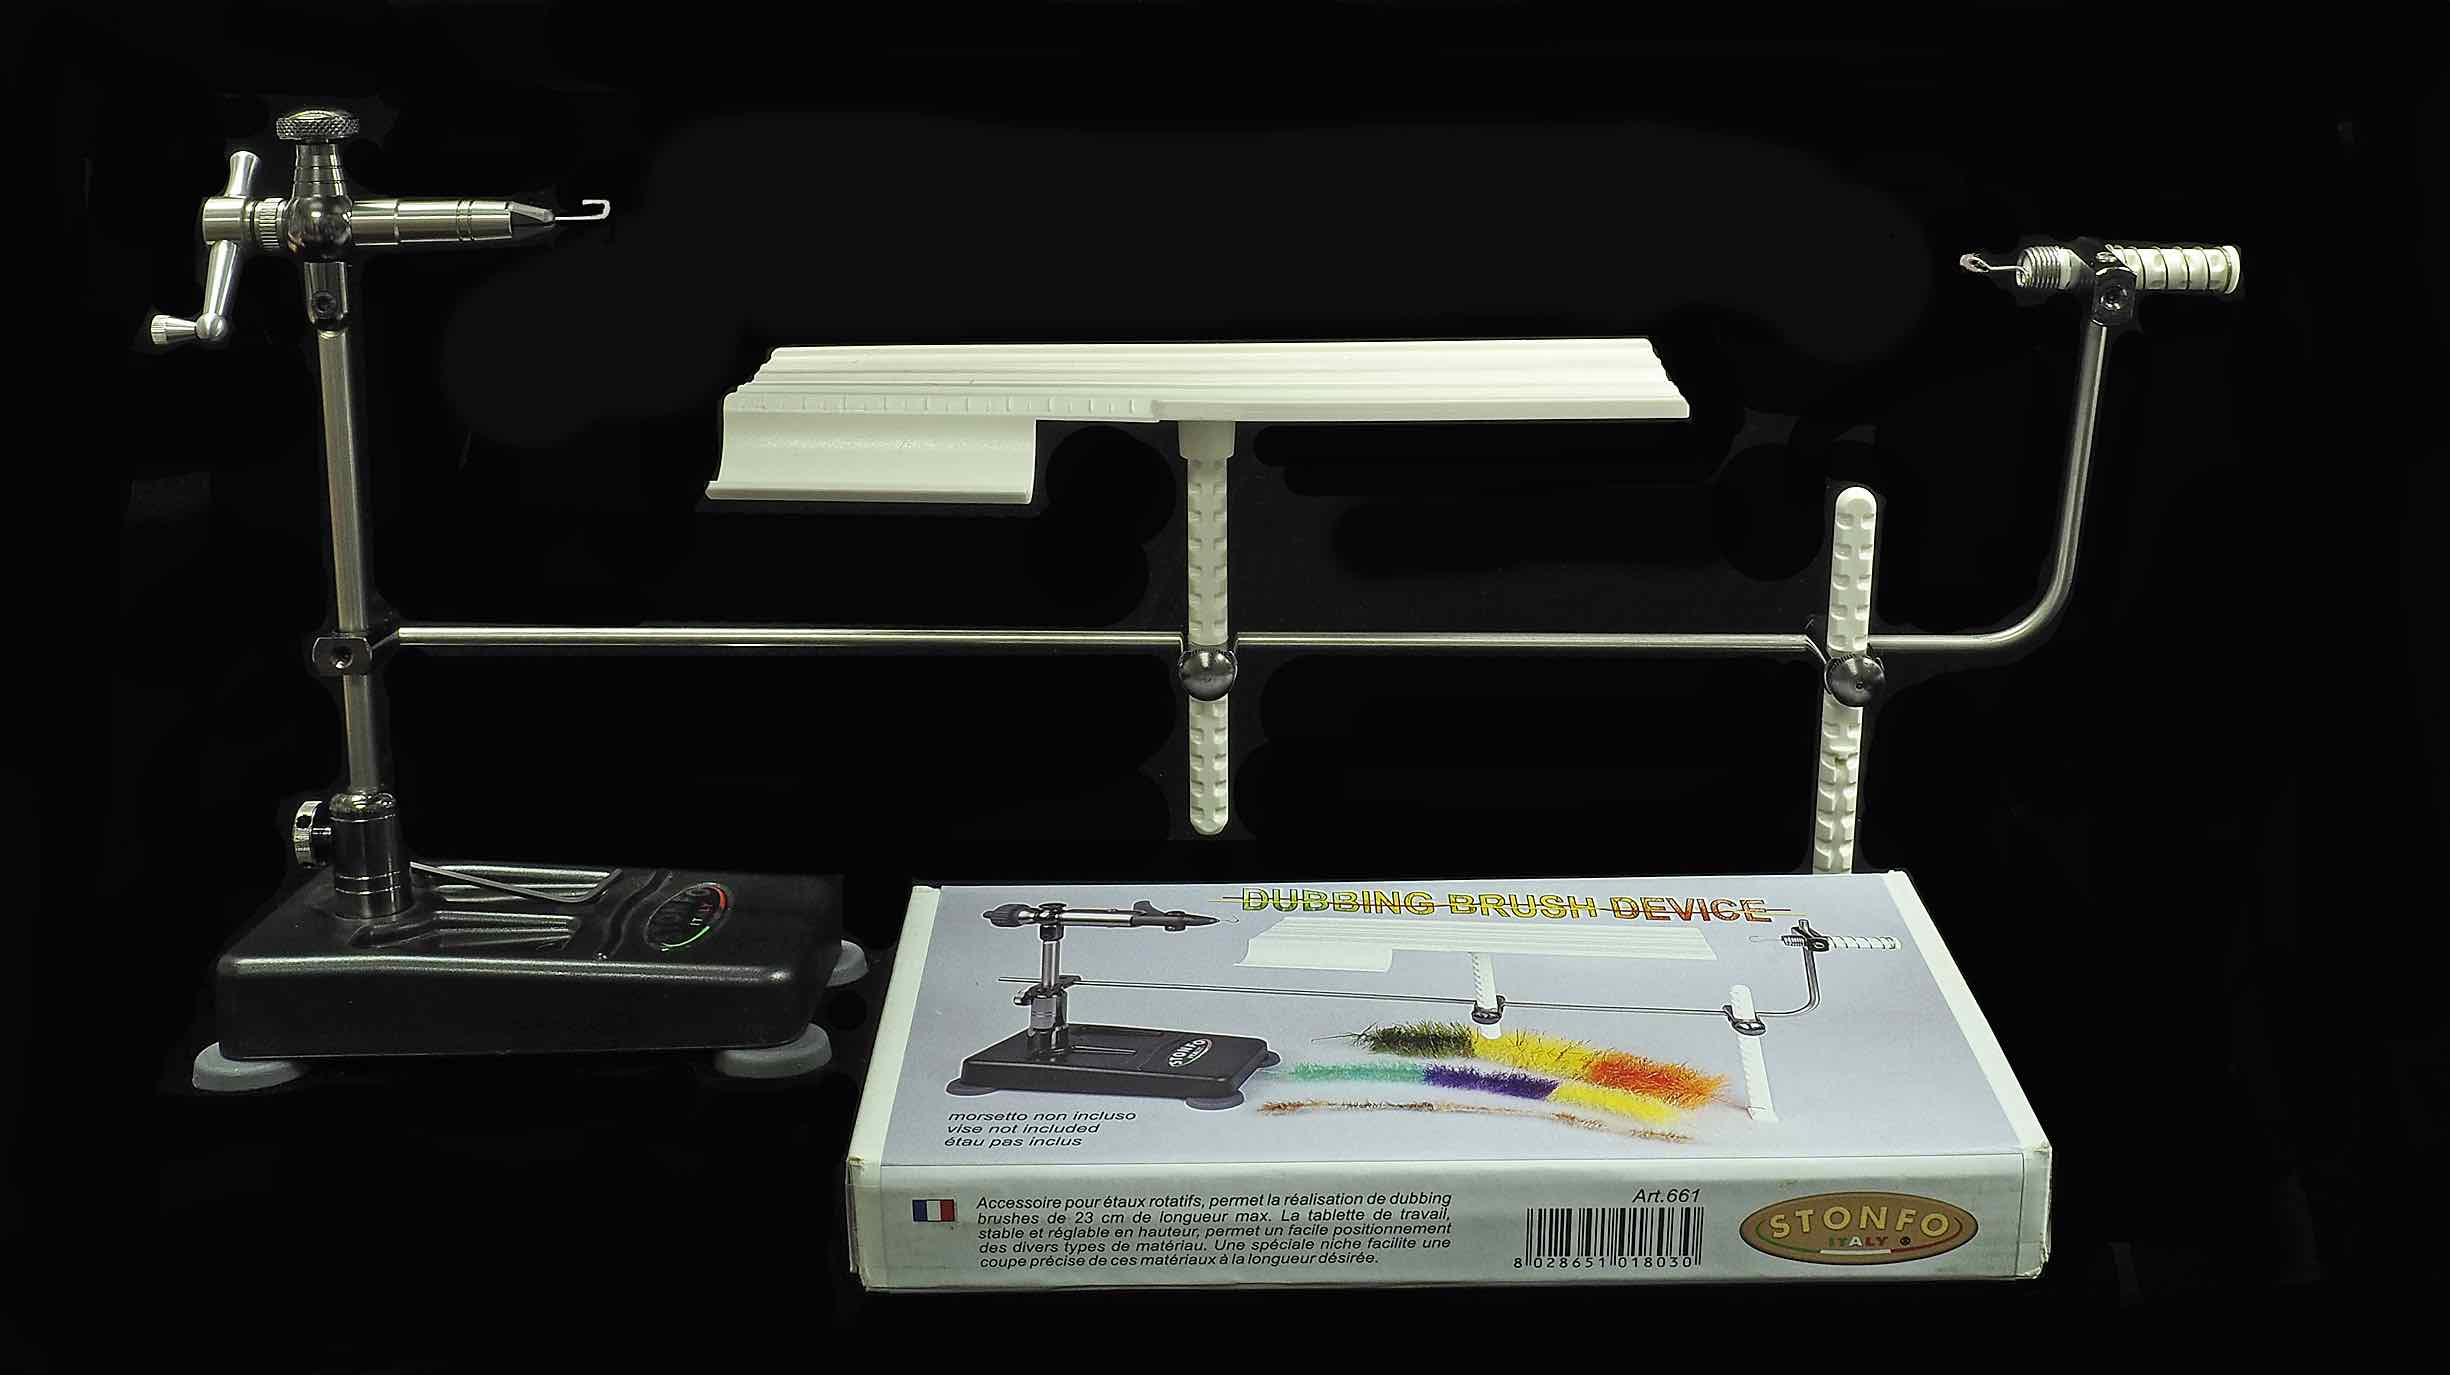 Stonfo Dubbing Brush Device.